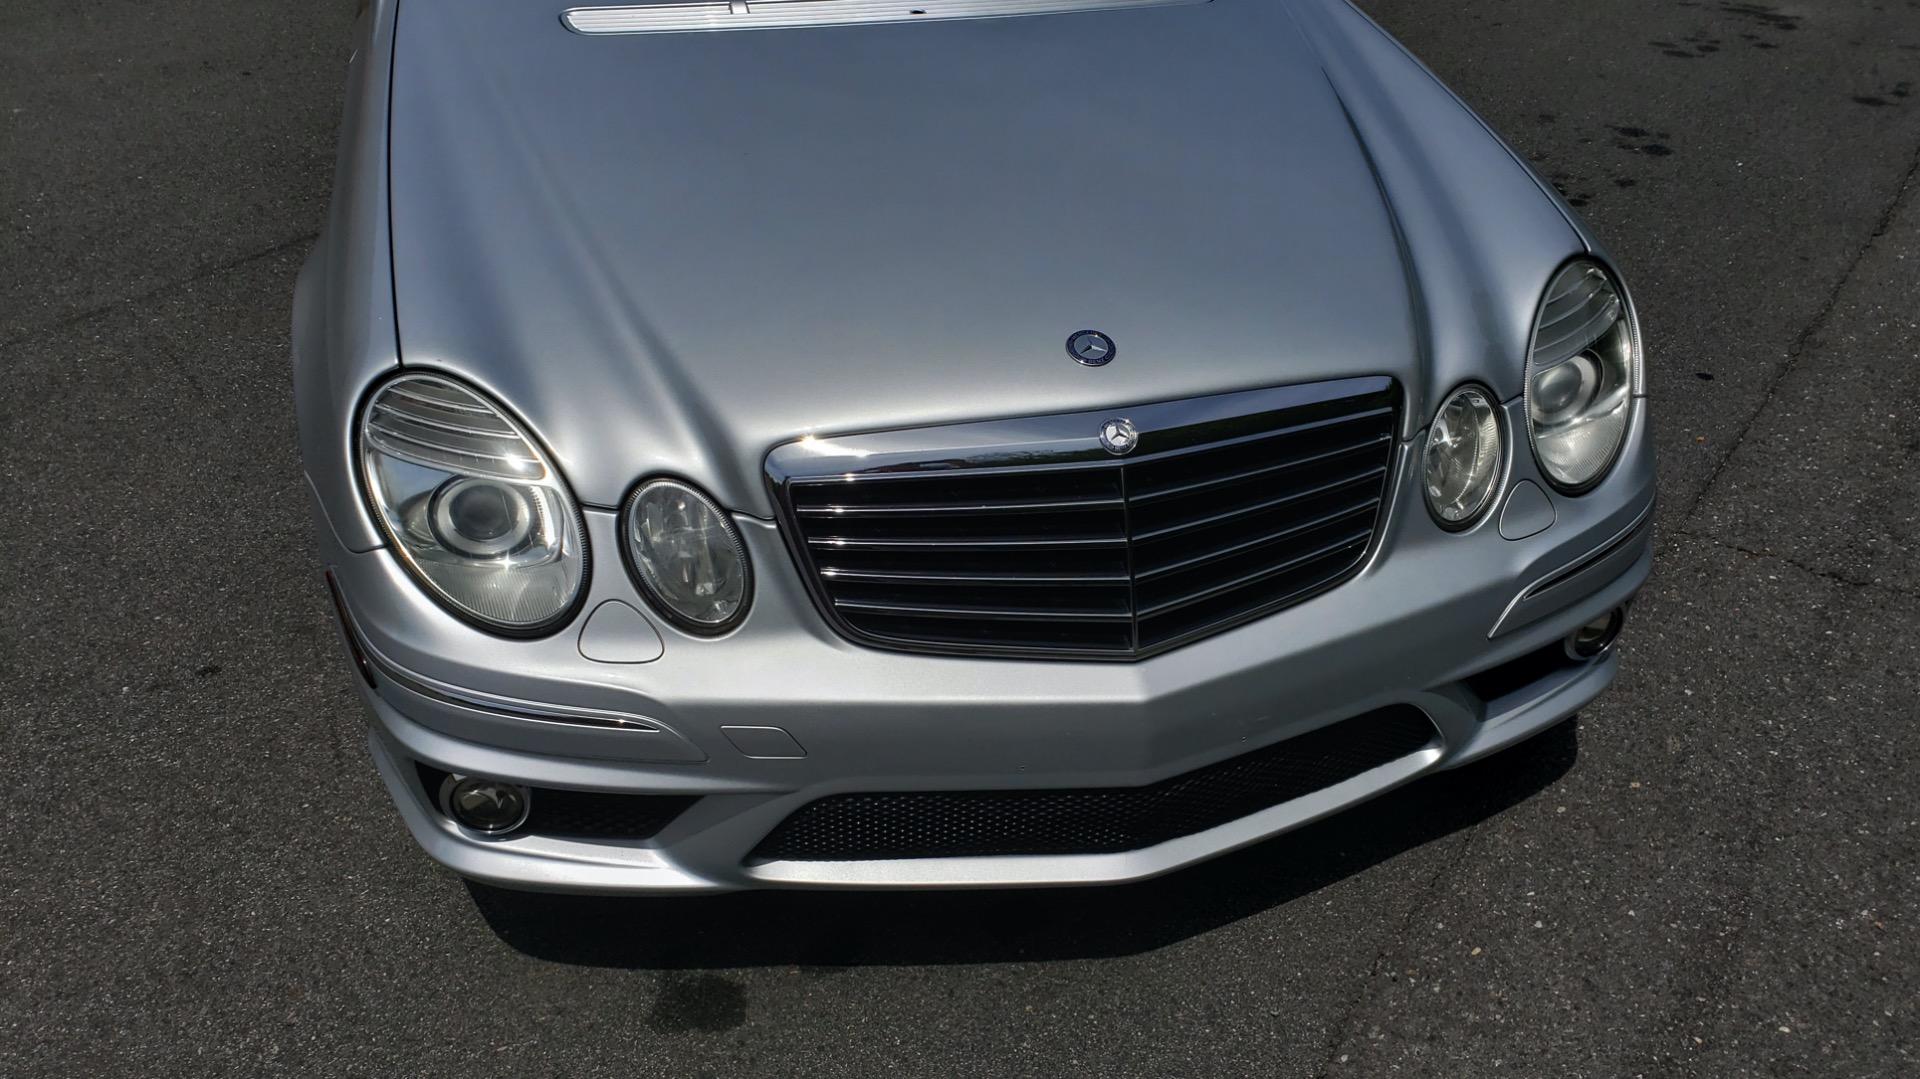 Used 2007 Mercedes-Benz E-Class E63 AMG WAGON / NAV / SUNROOF / HARMAN/KARDON for sale $29,000 at Formula Imports in Charlotte NC 28227 34